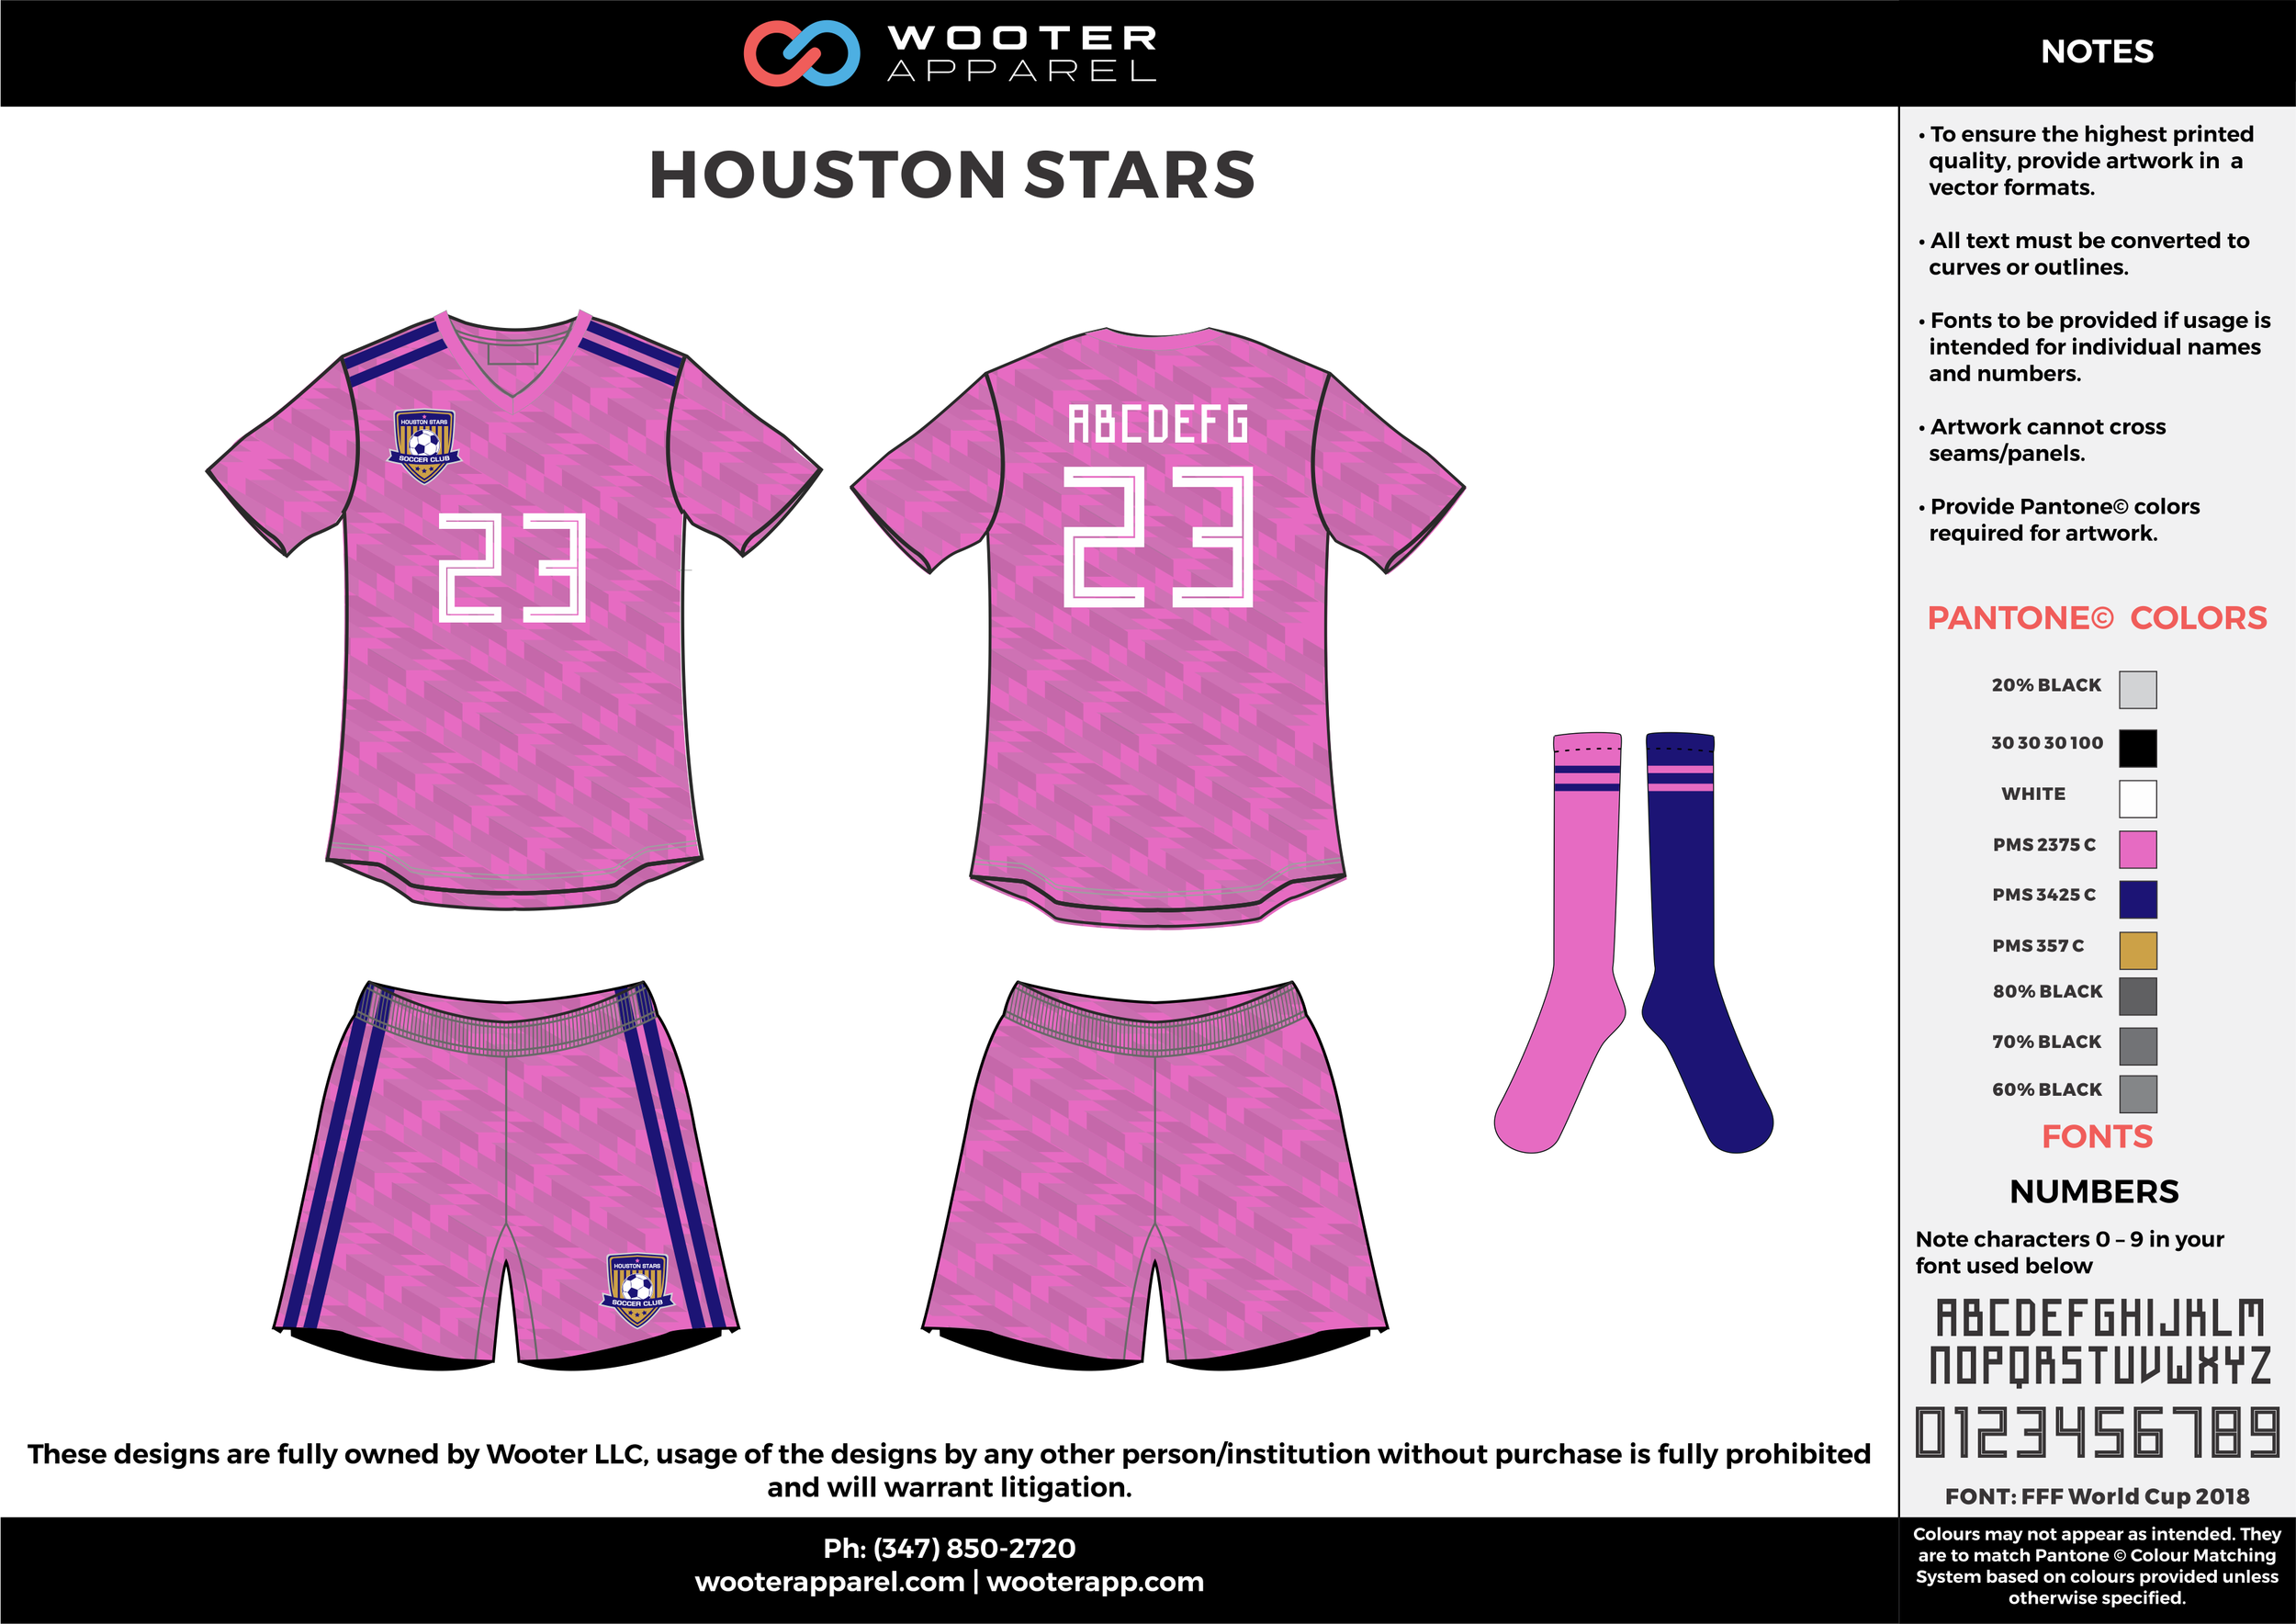 HOUSTON STARS pink blue gray white custom sublimated soccer uniform jersey shirt shorts socks